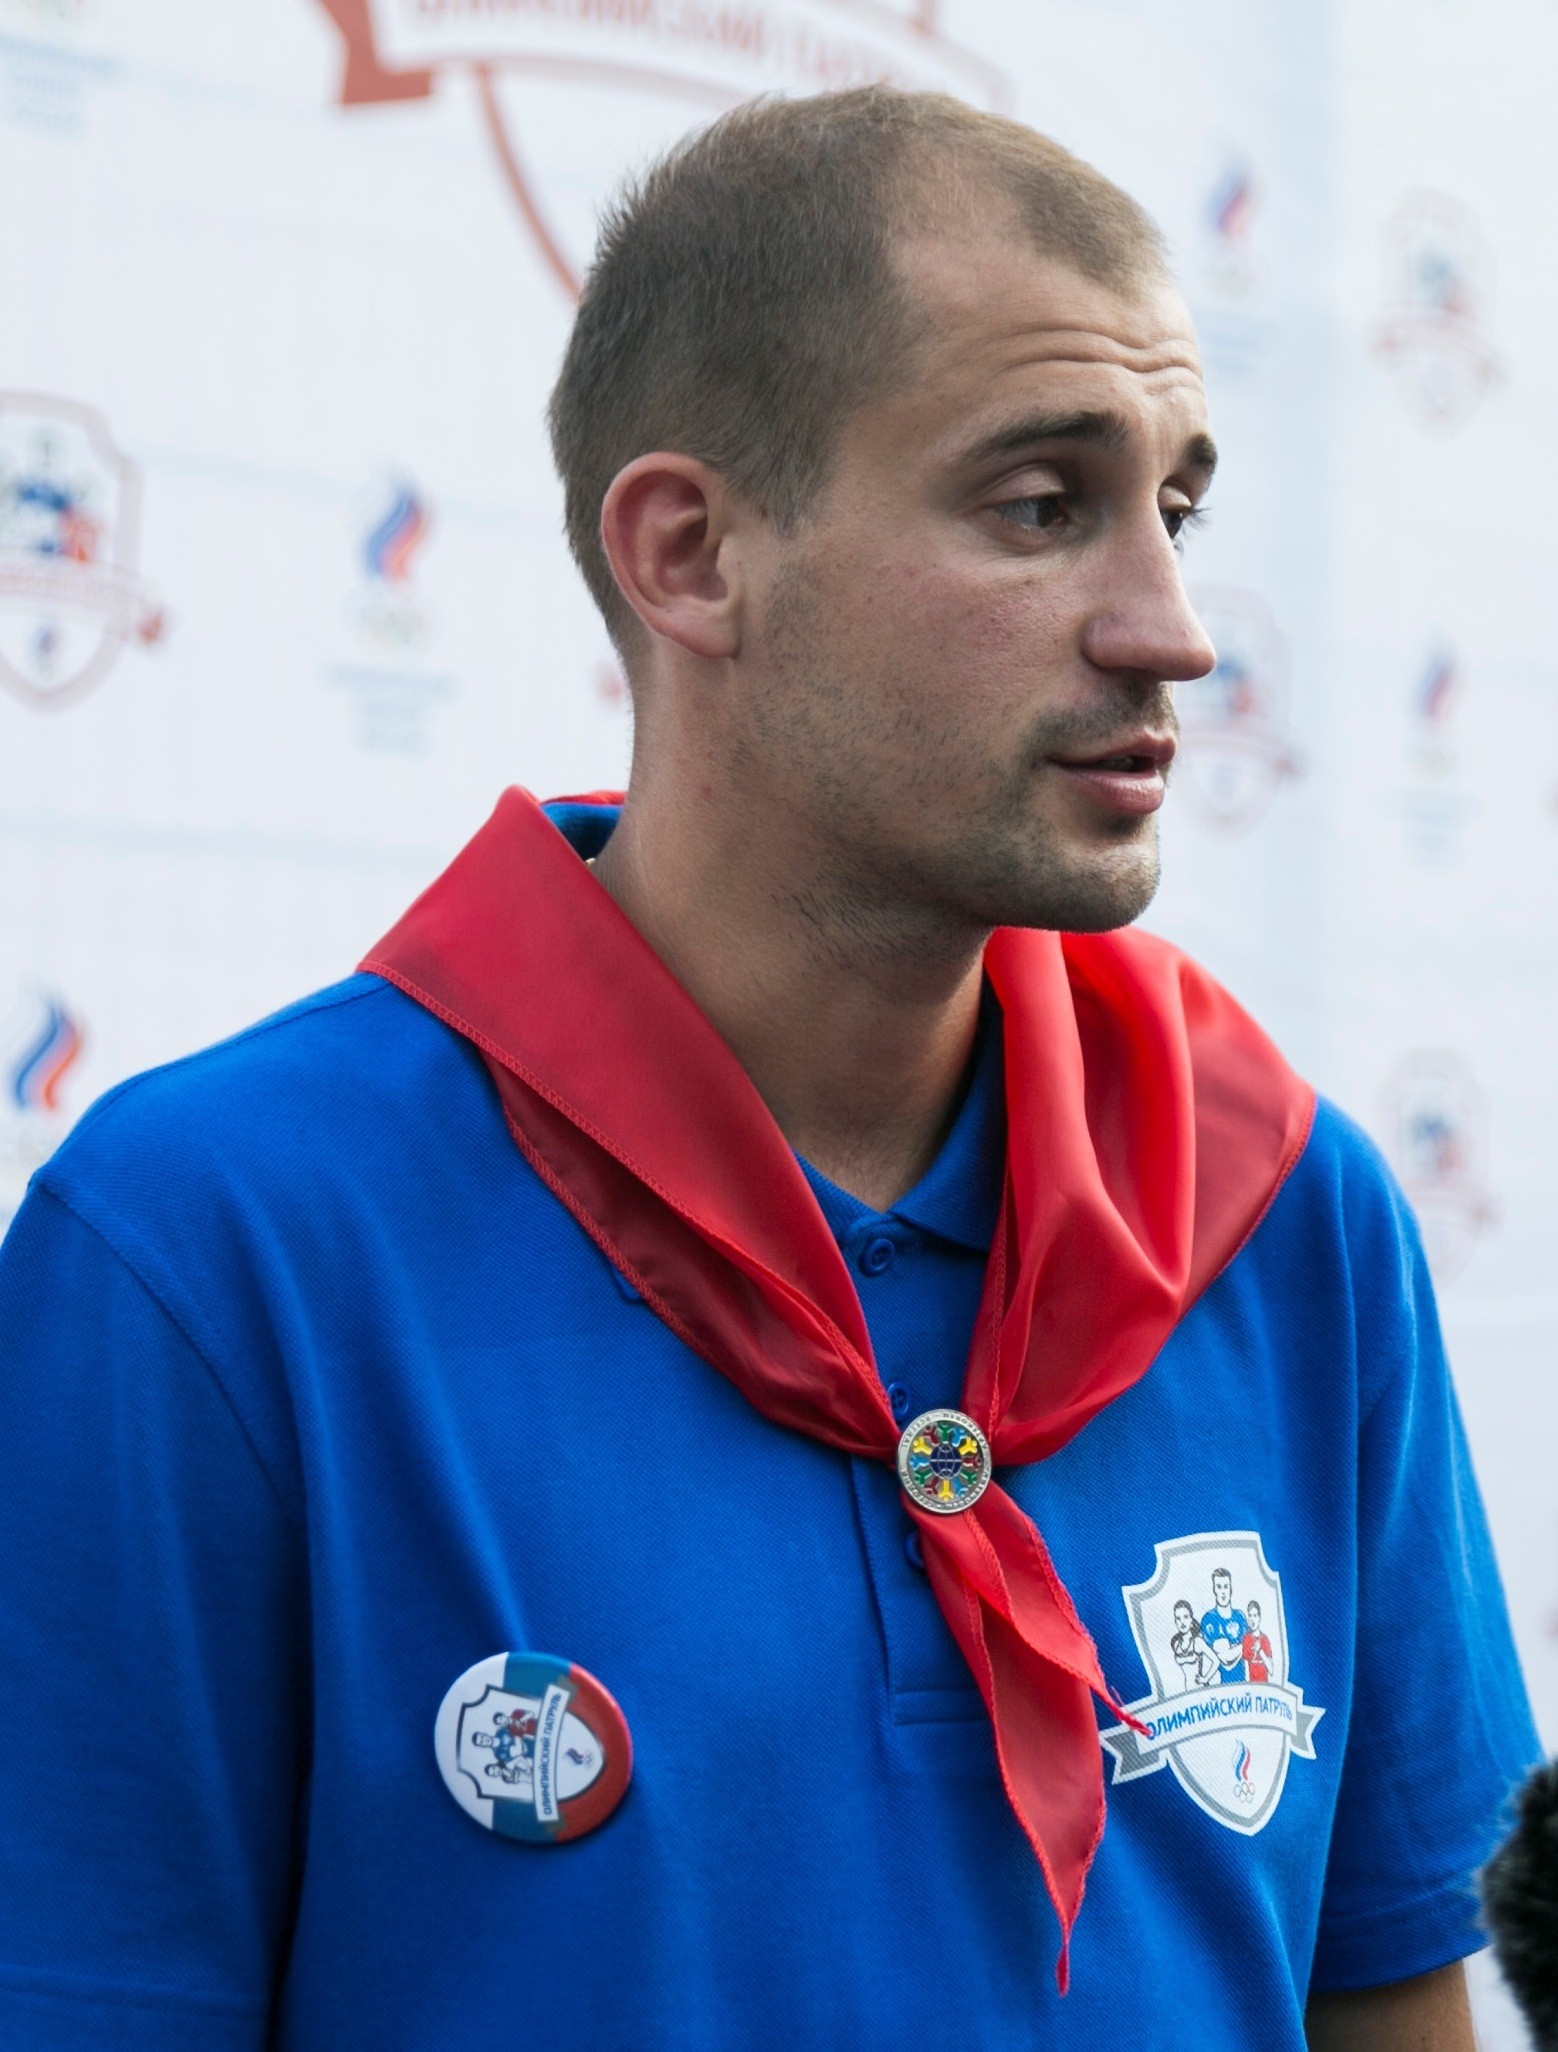 Alexandr Lesun